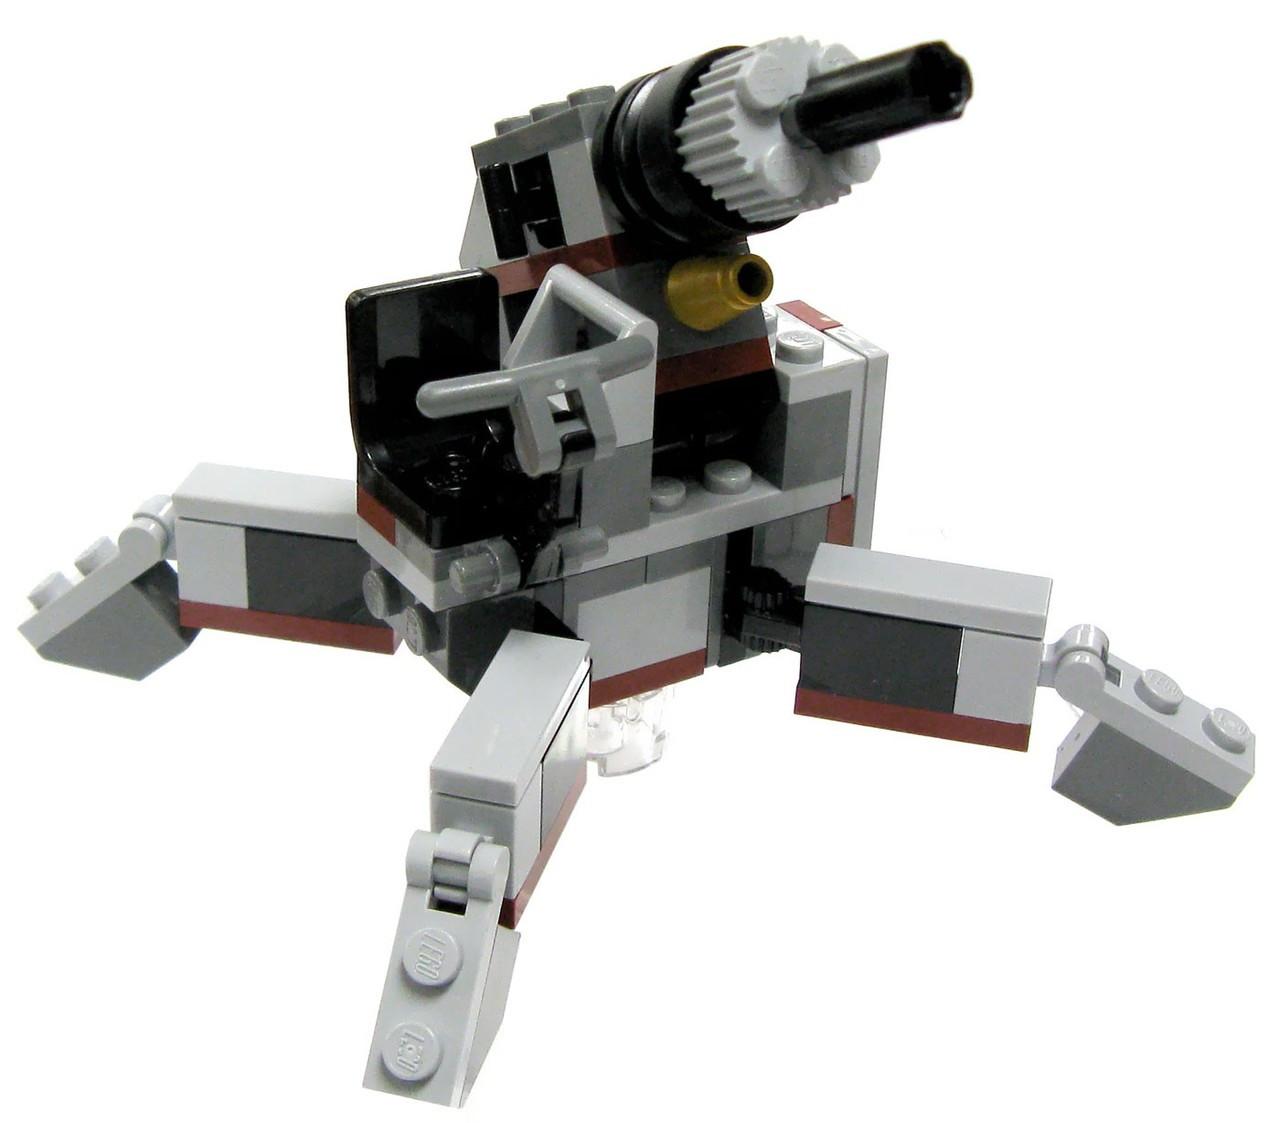 LEGO Star Wars The Clone Wars Loose Mini Vehicles AV-7 Antivehicle Cannon Loose Vehicle [Loose]